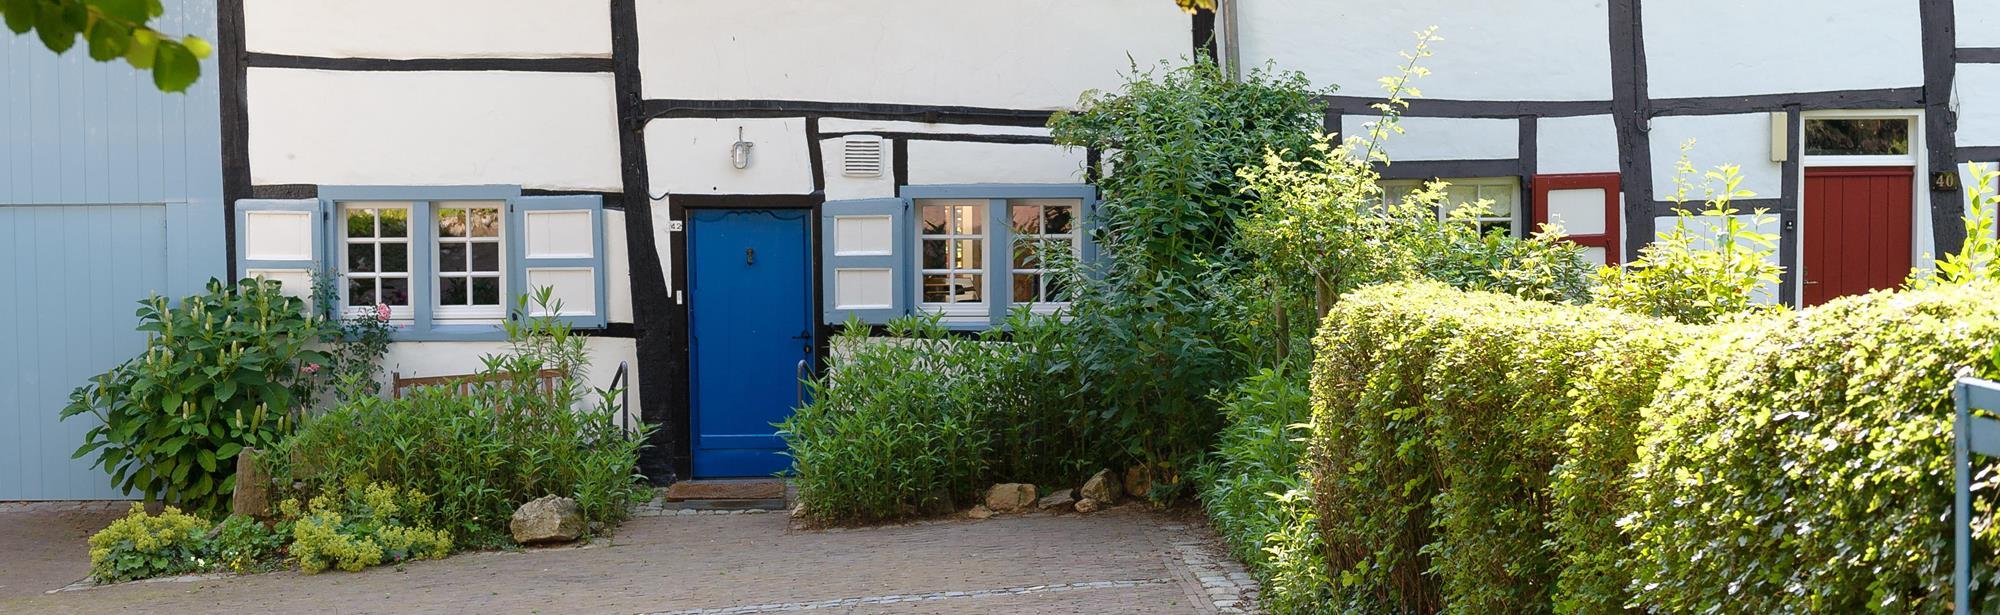 Boerenhuis Bommerig